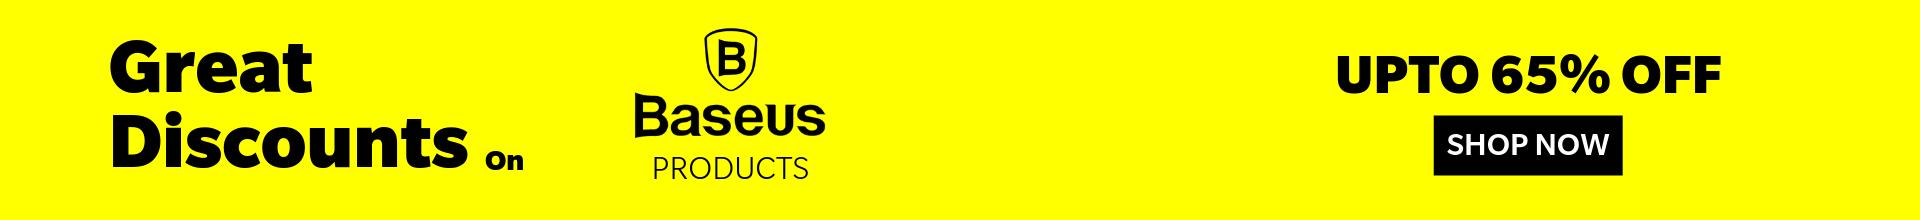 Baseus Discount Web Banner 1920×220